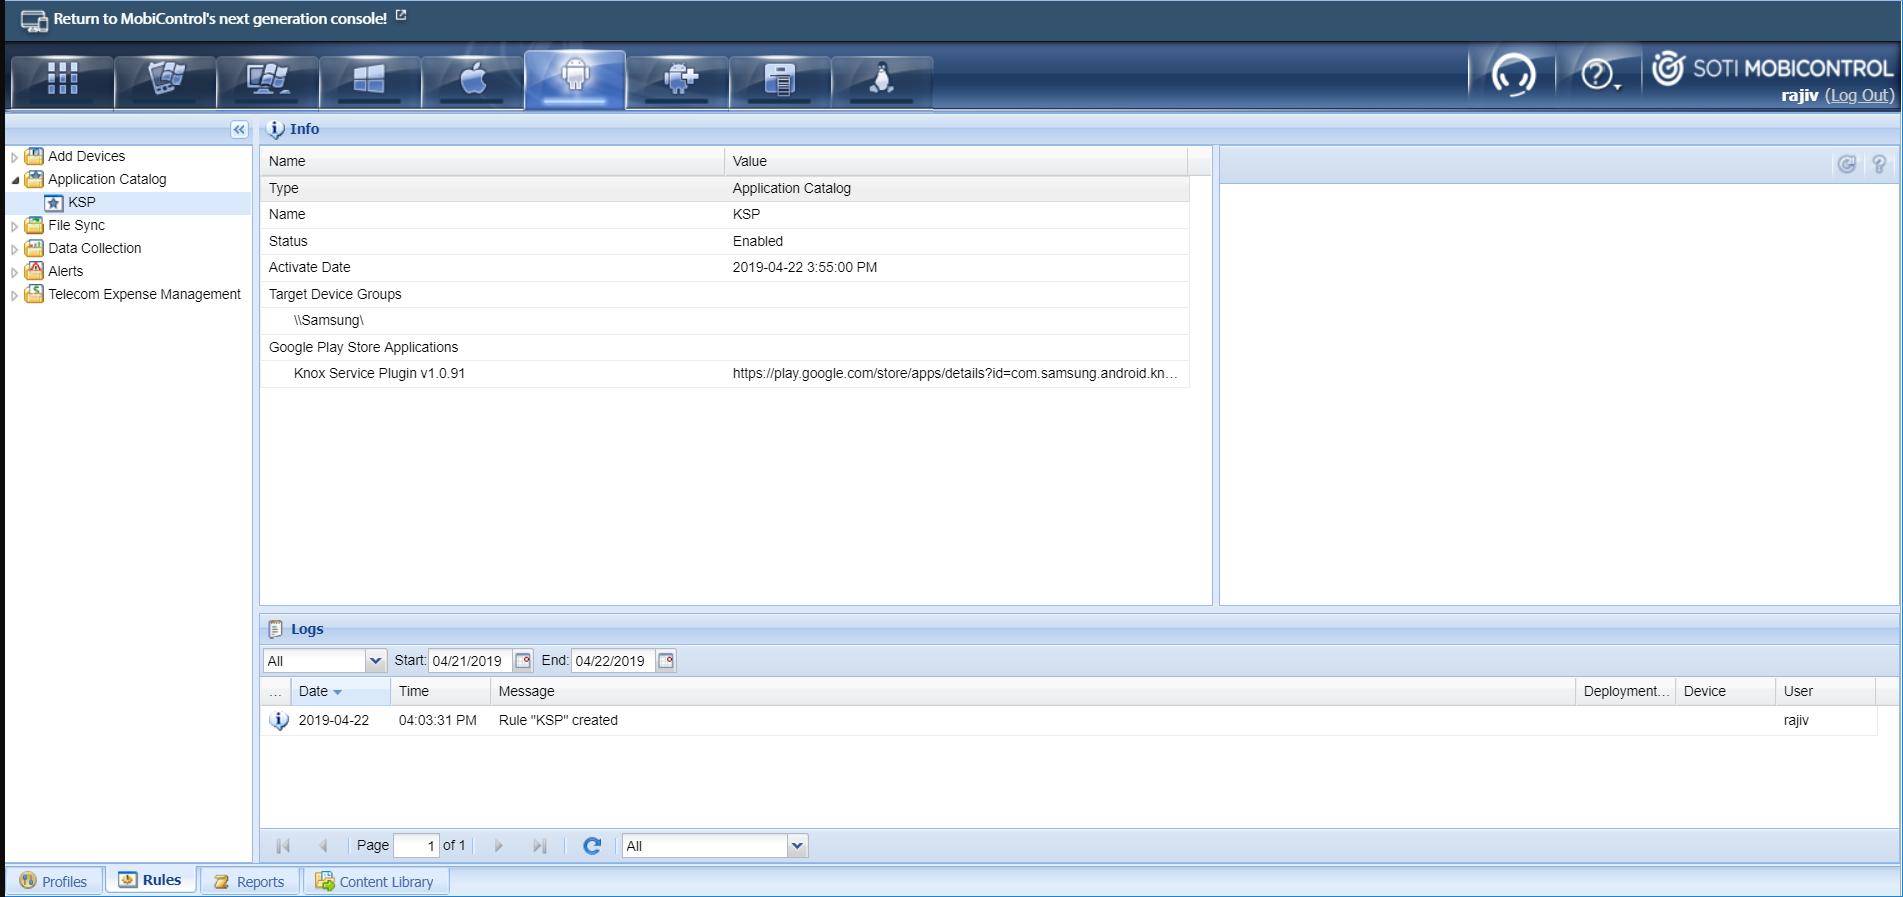 SOTI MobiControl Application Catalog page - KSP